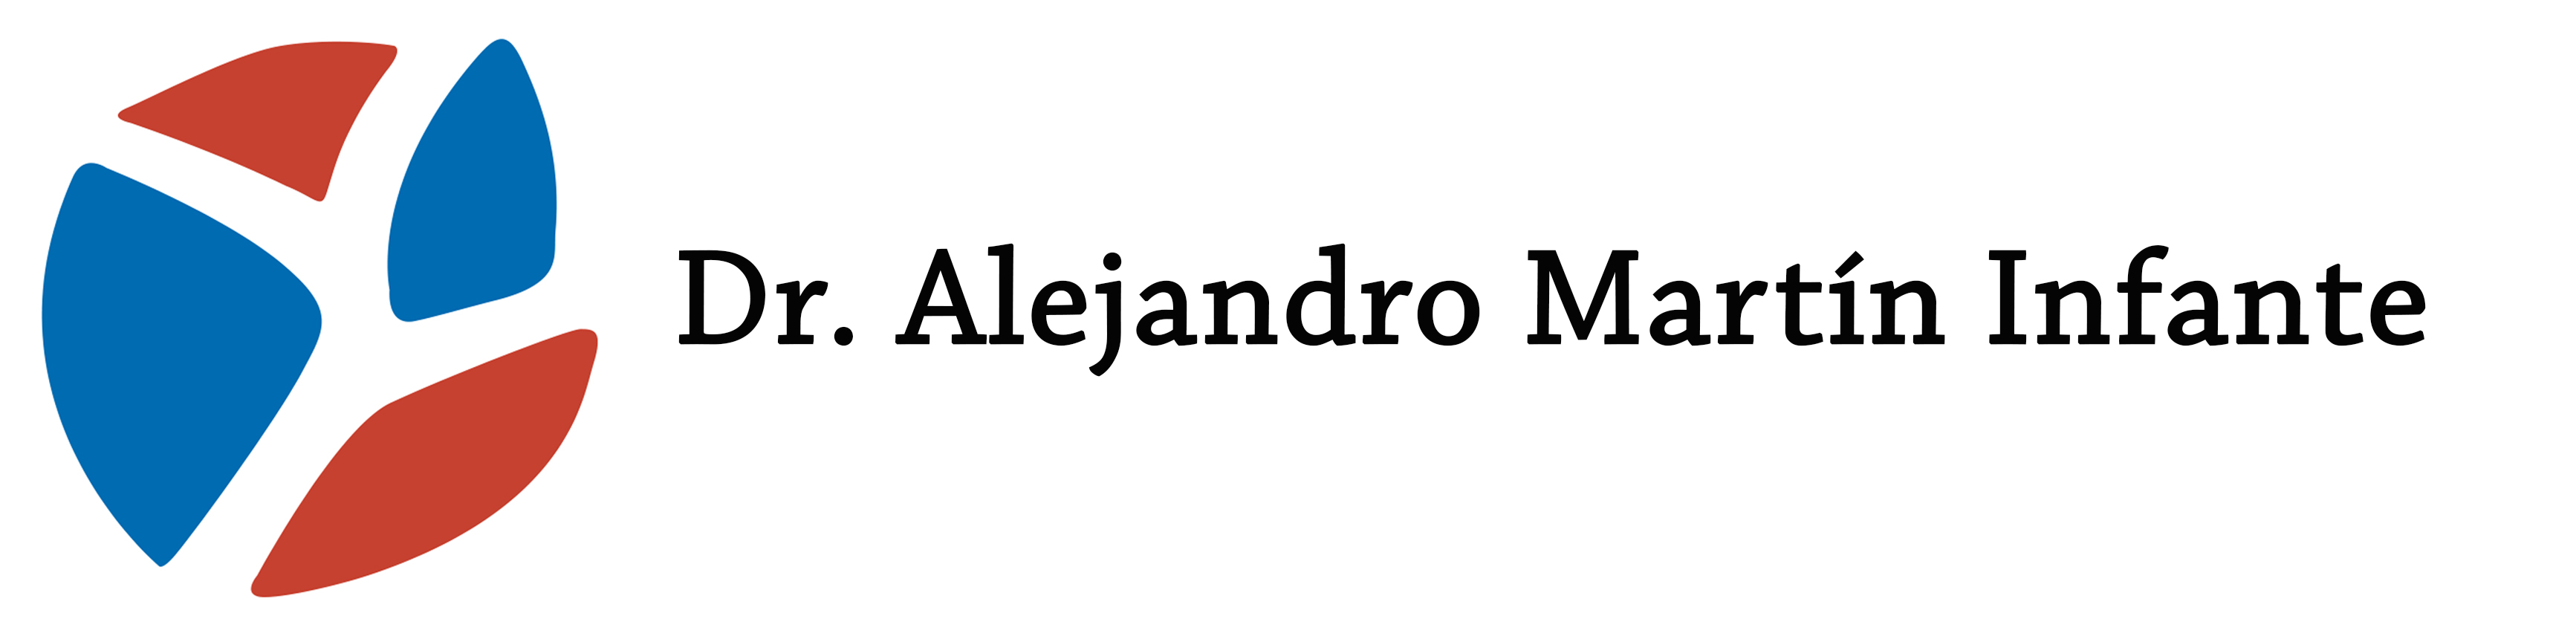 Dr. Alejandro Martín Infante